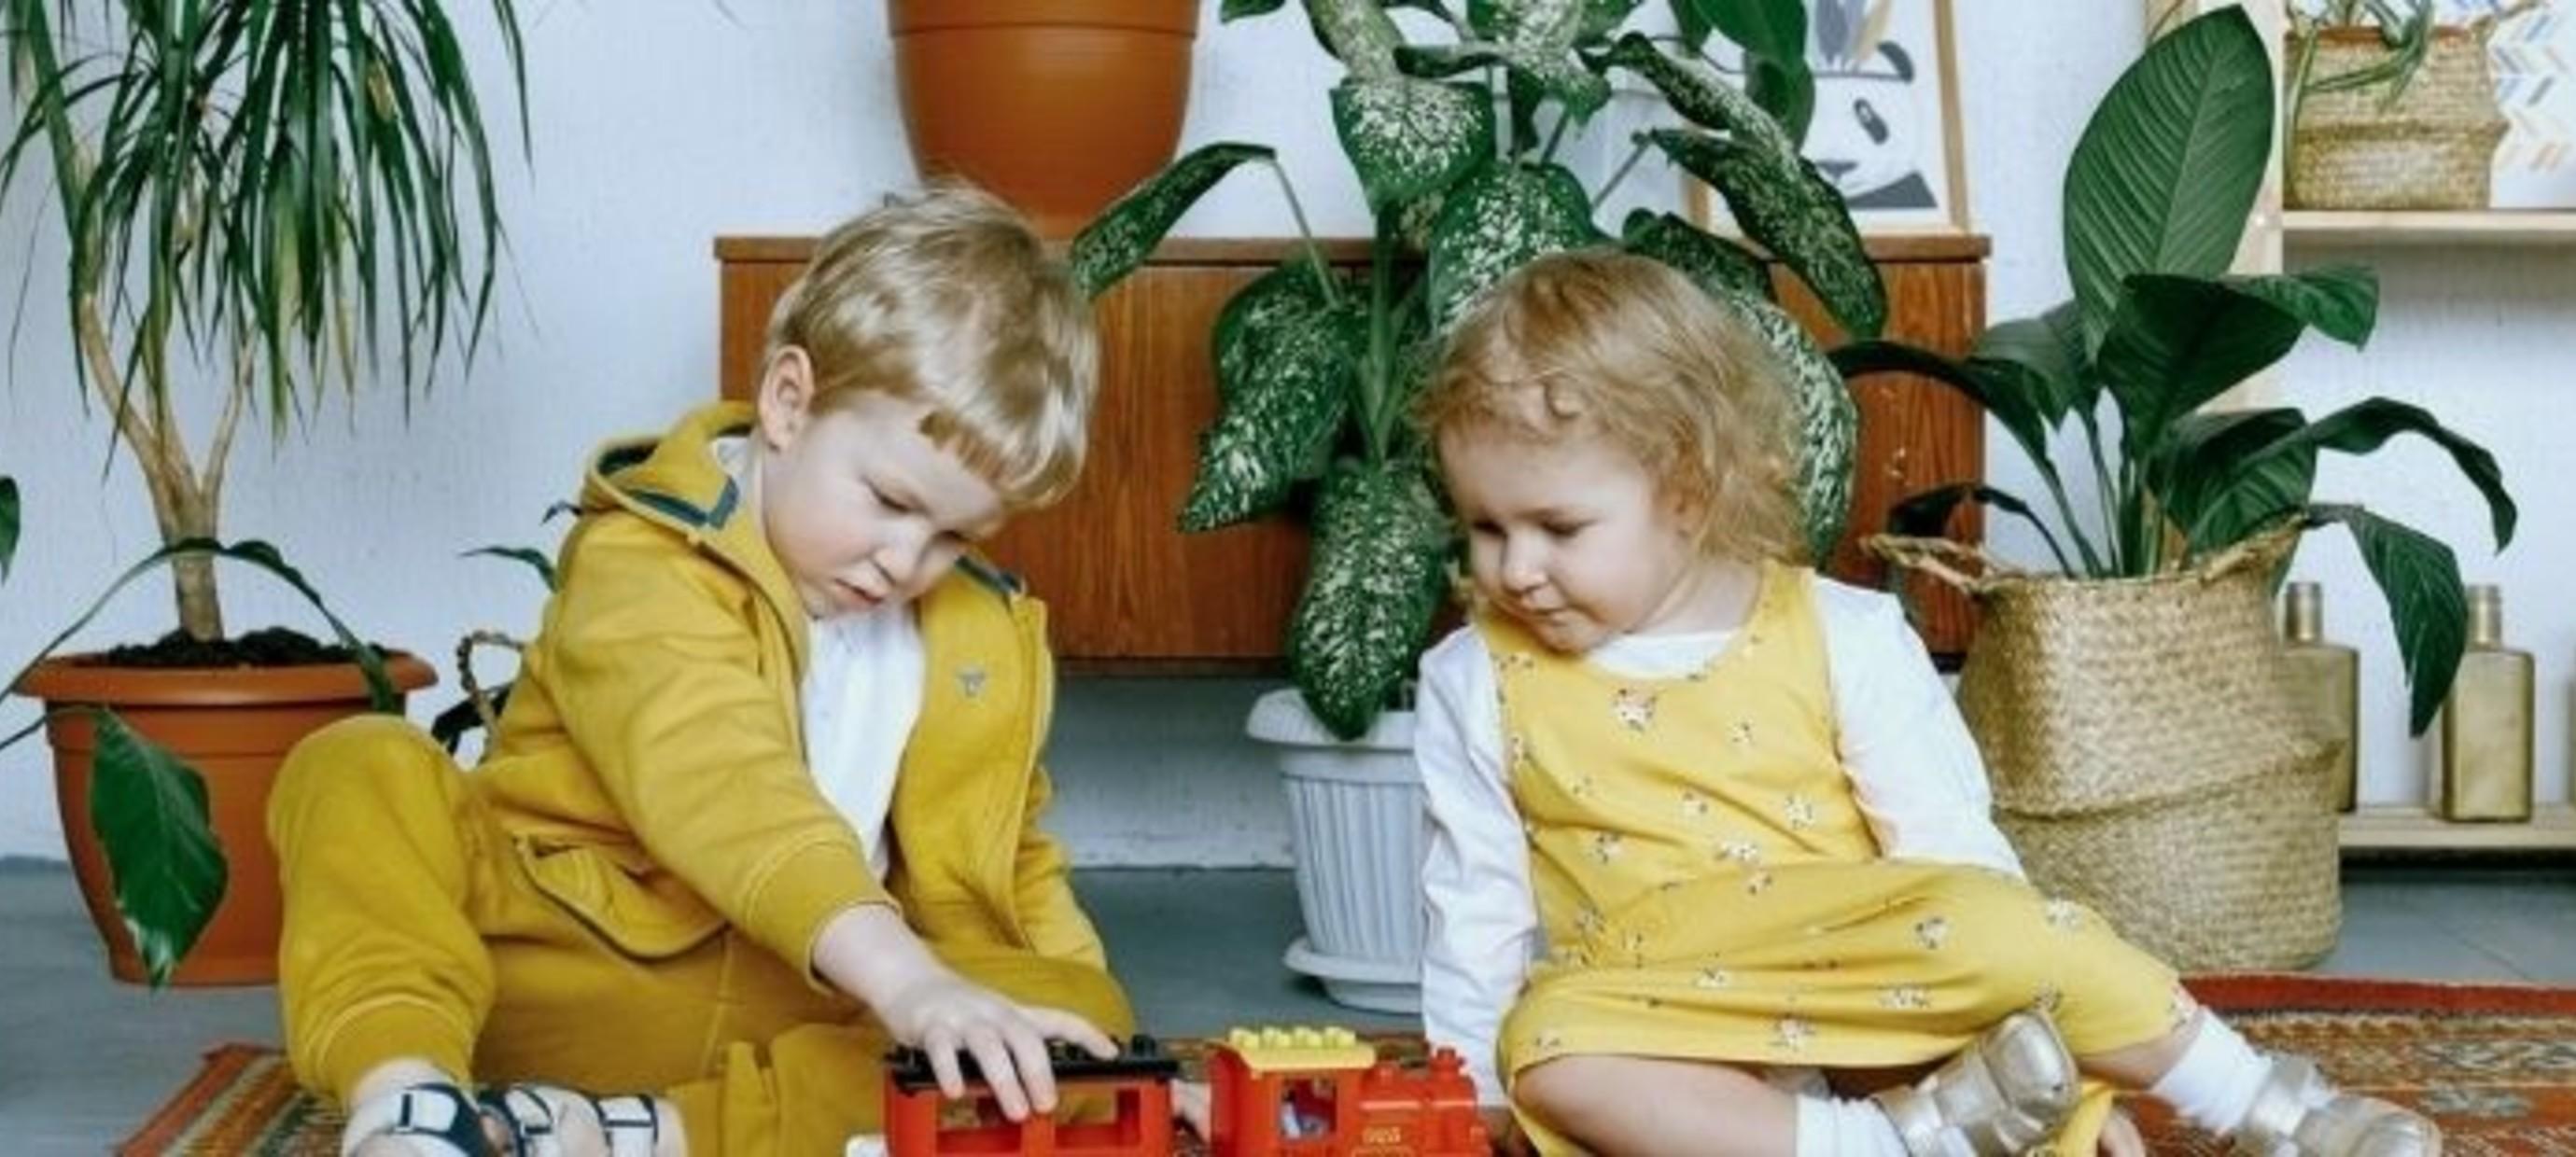 Kamerplanten in de kinderkamer